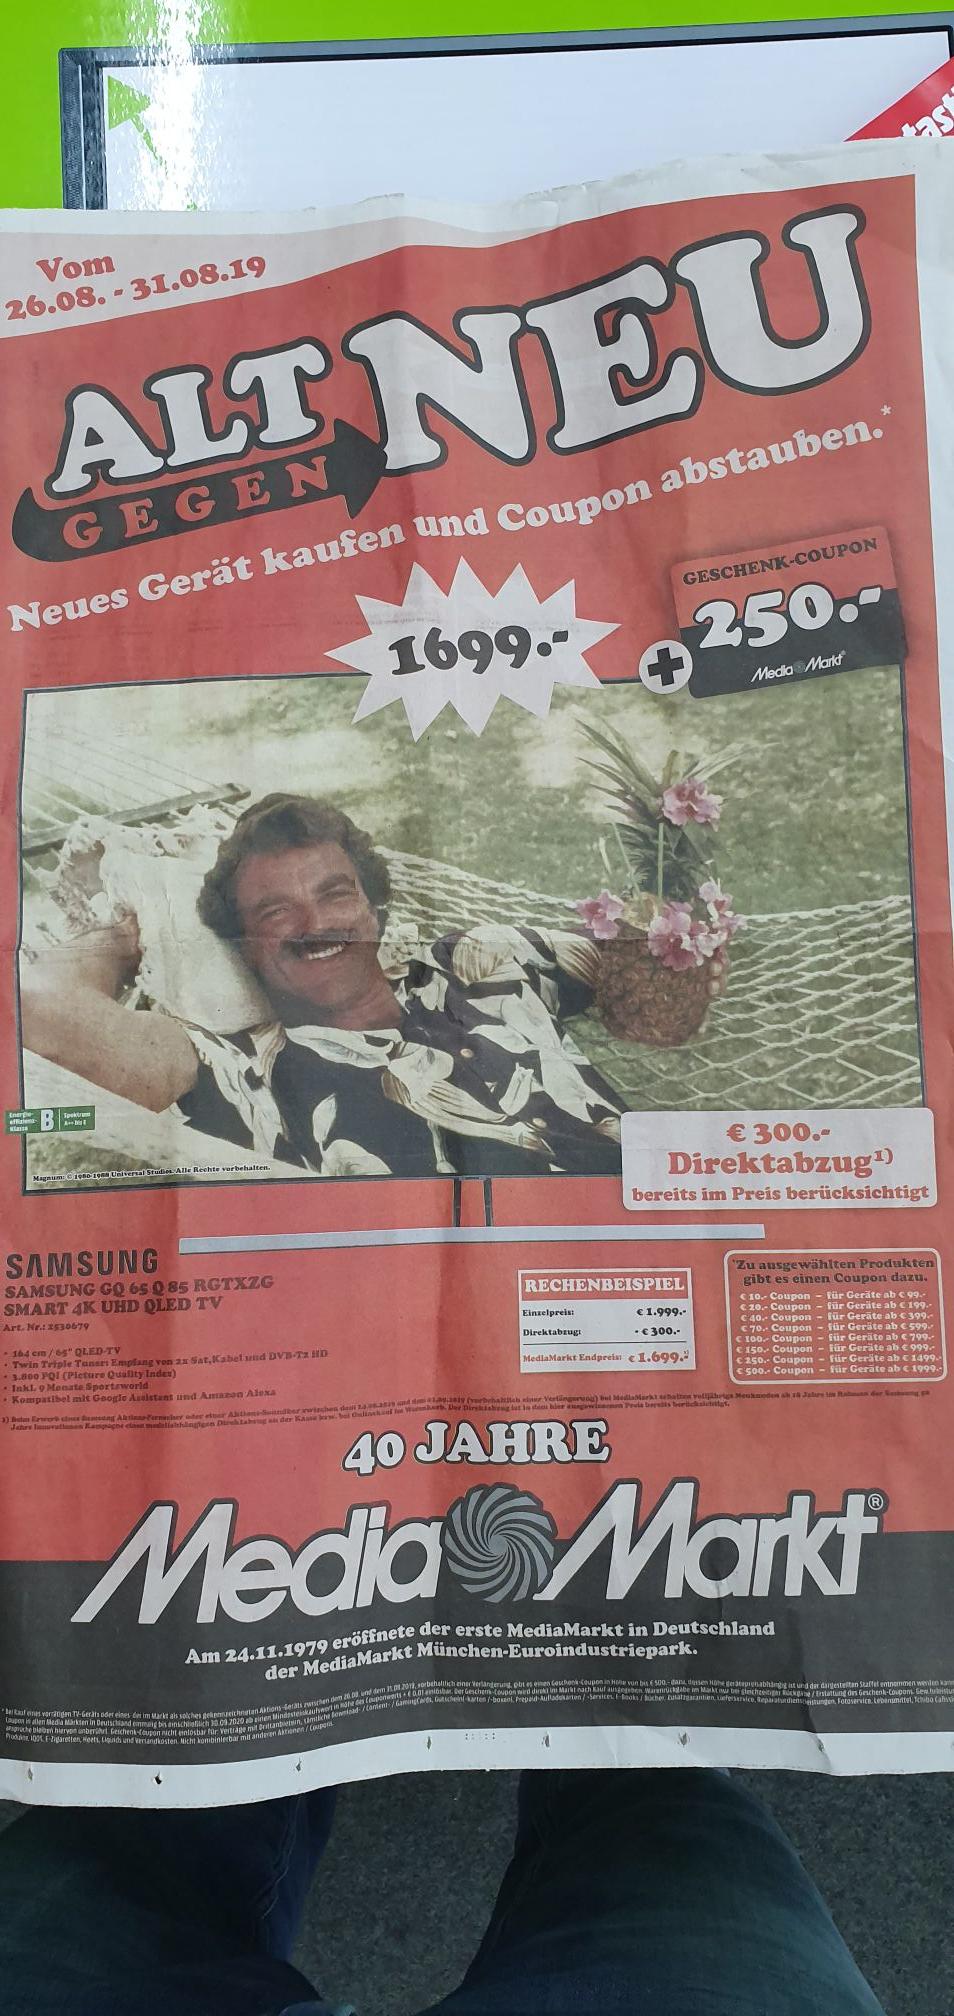 Samsung GQ65Q85RGT + 250€ Coupon TV Fernseher 4K Smart MediaMarkt Porta Westfalica